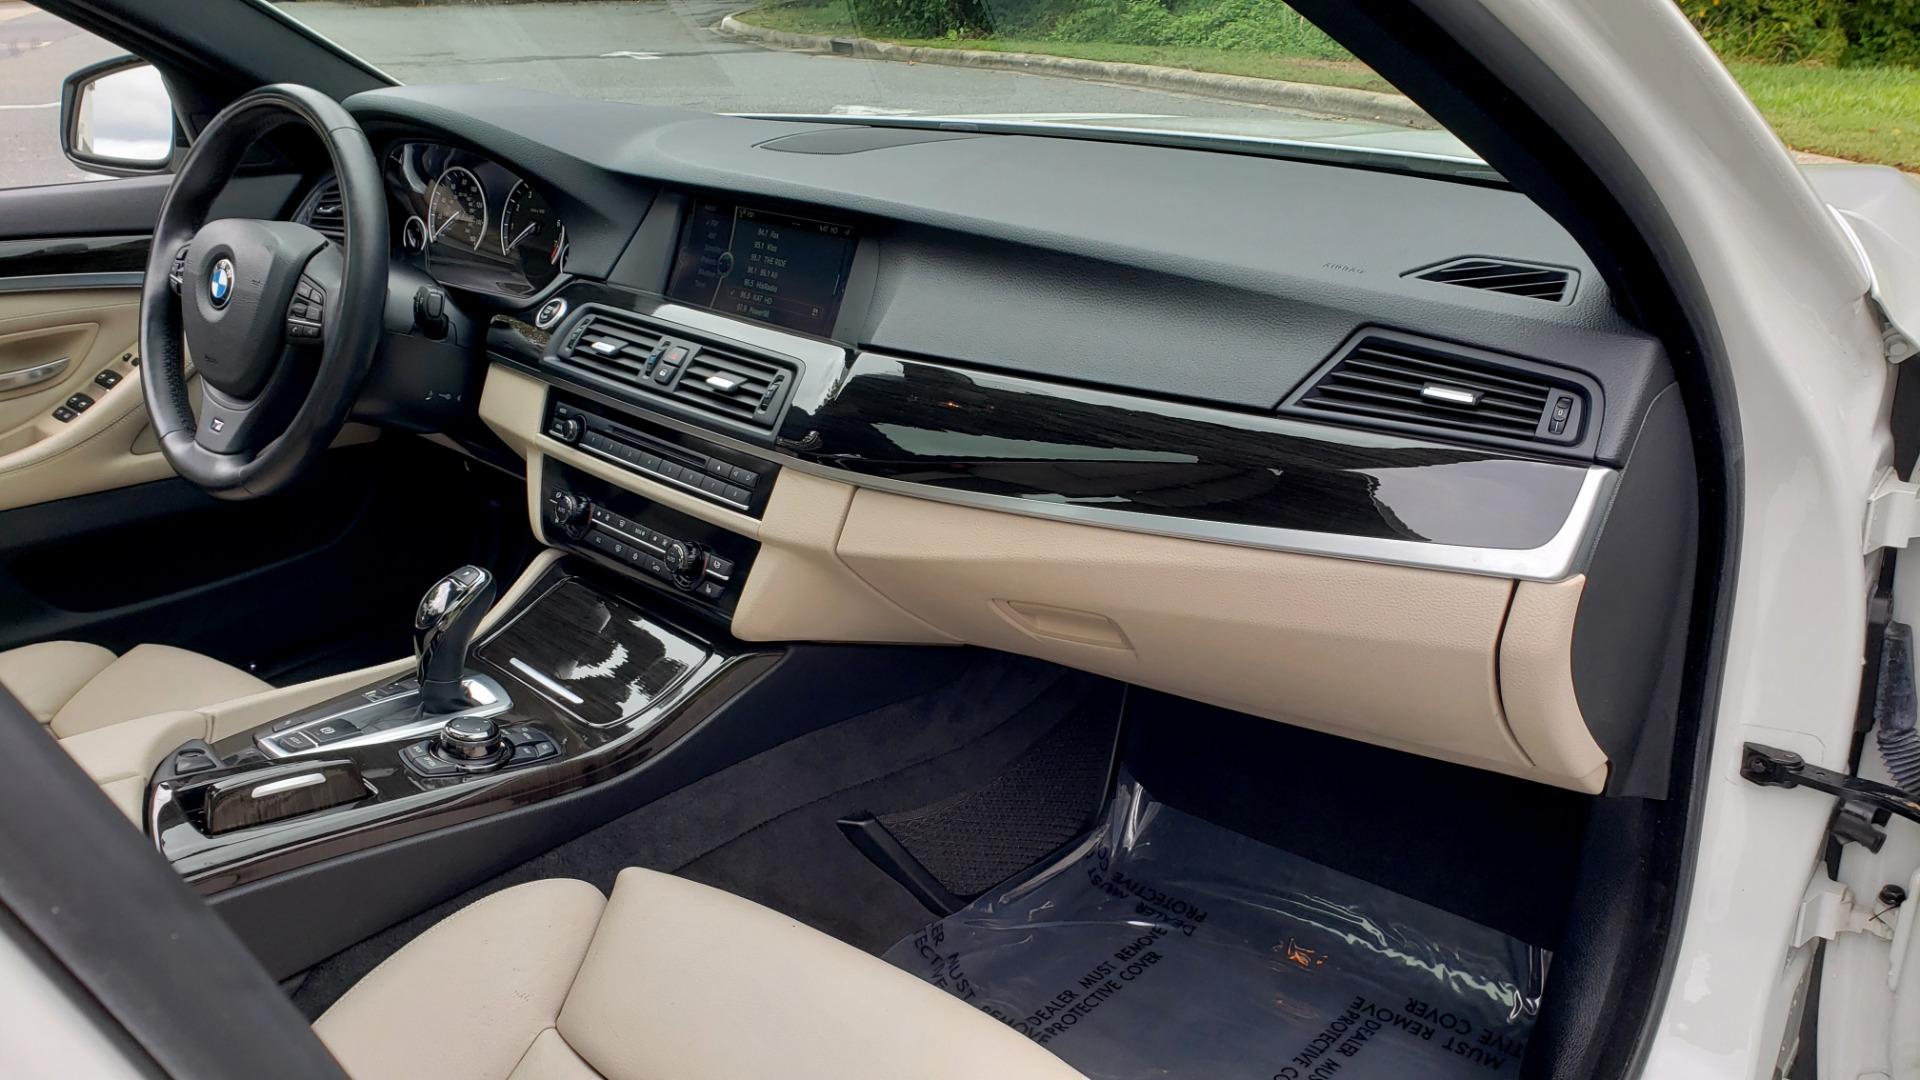 Used 2012 BMW 5 SERIES 550I M SPORT / NAV / CONV PKG / SUNROOF / PREM SND / REARVIEW for sale Sold at Formula Imports in Charlotte NC 28227 57